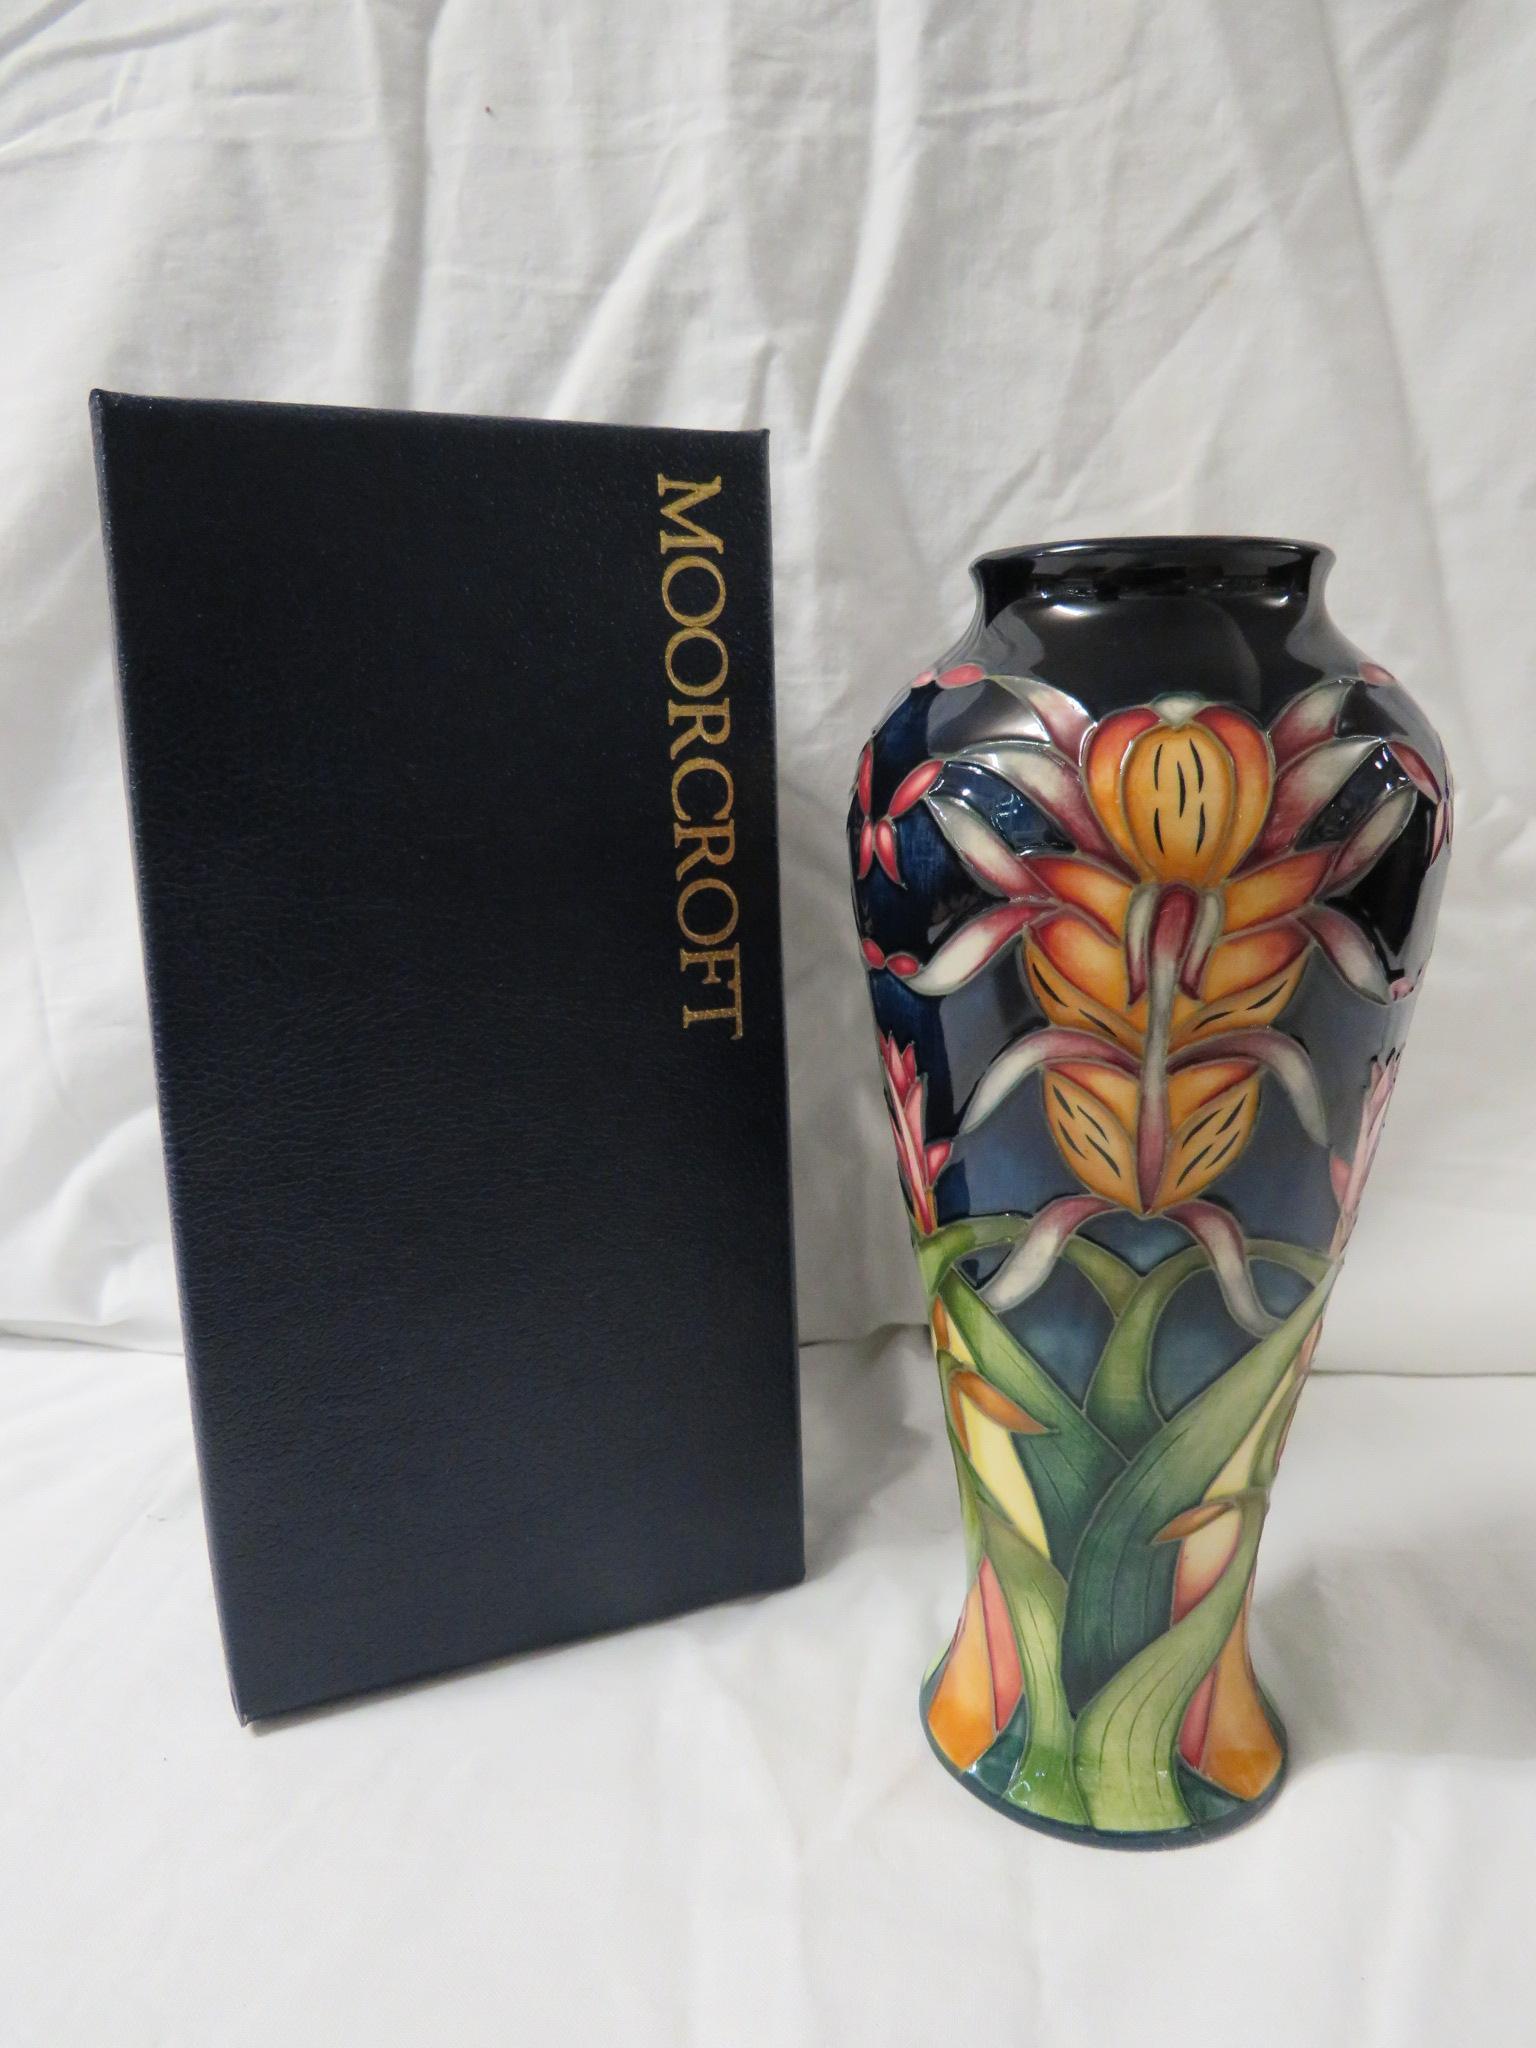 Lot 6 - Moorcroft pottery Lizard Orchid three star members vase, high shouldered baluster form, dark blue